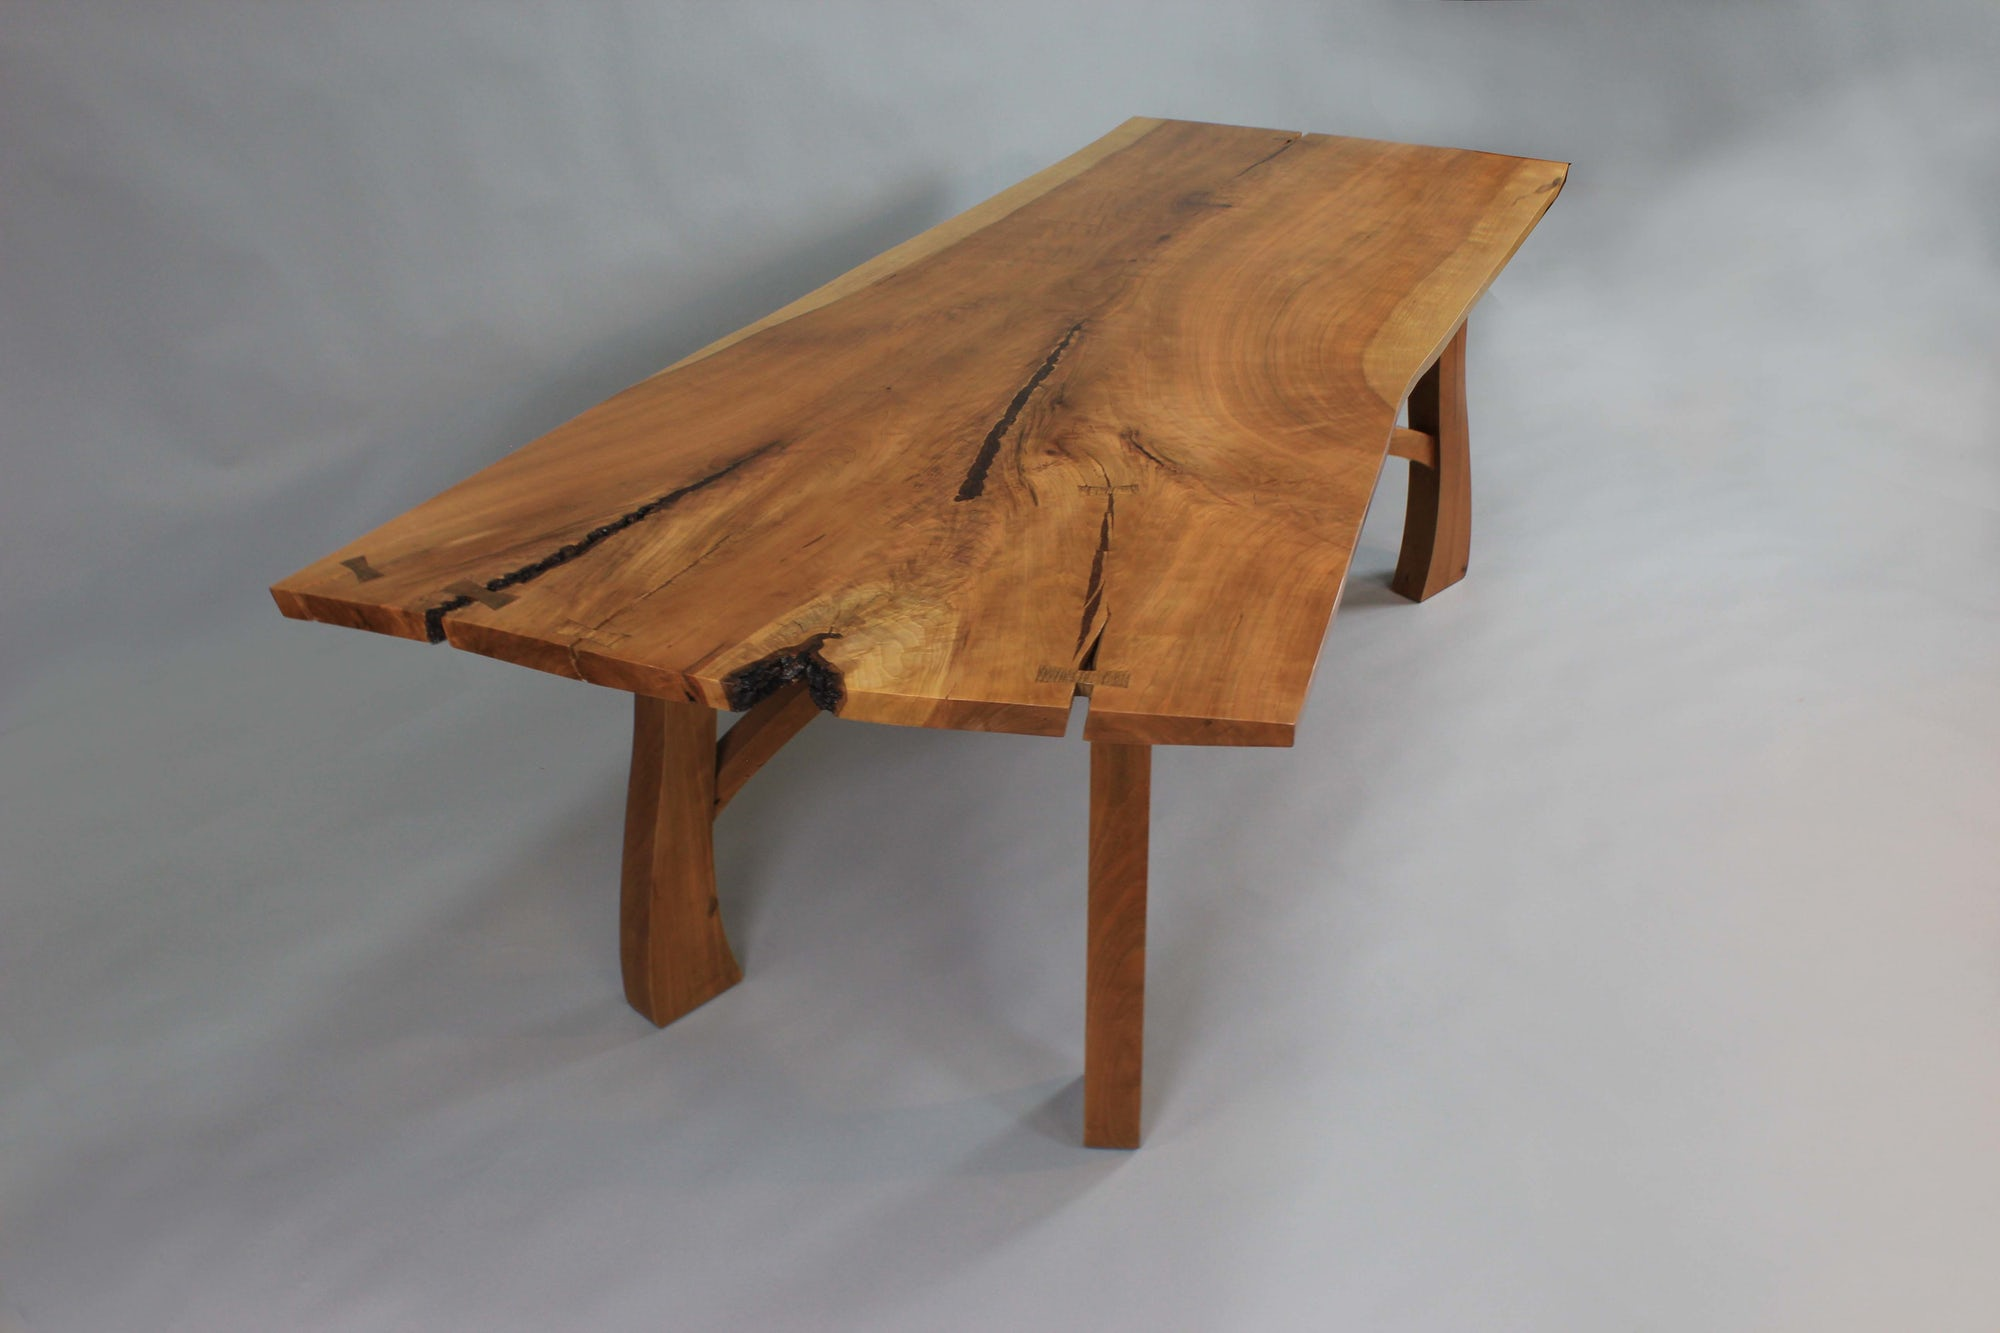 Slab_Table_Long_View_Sm